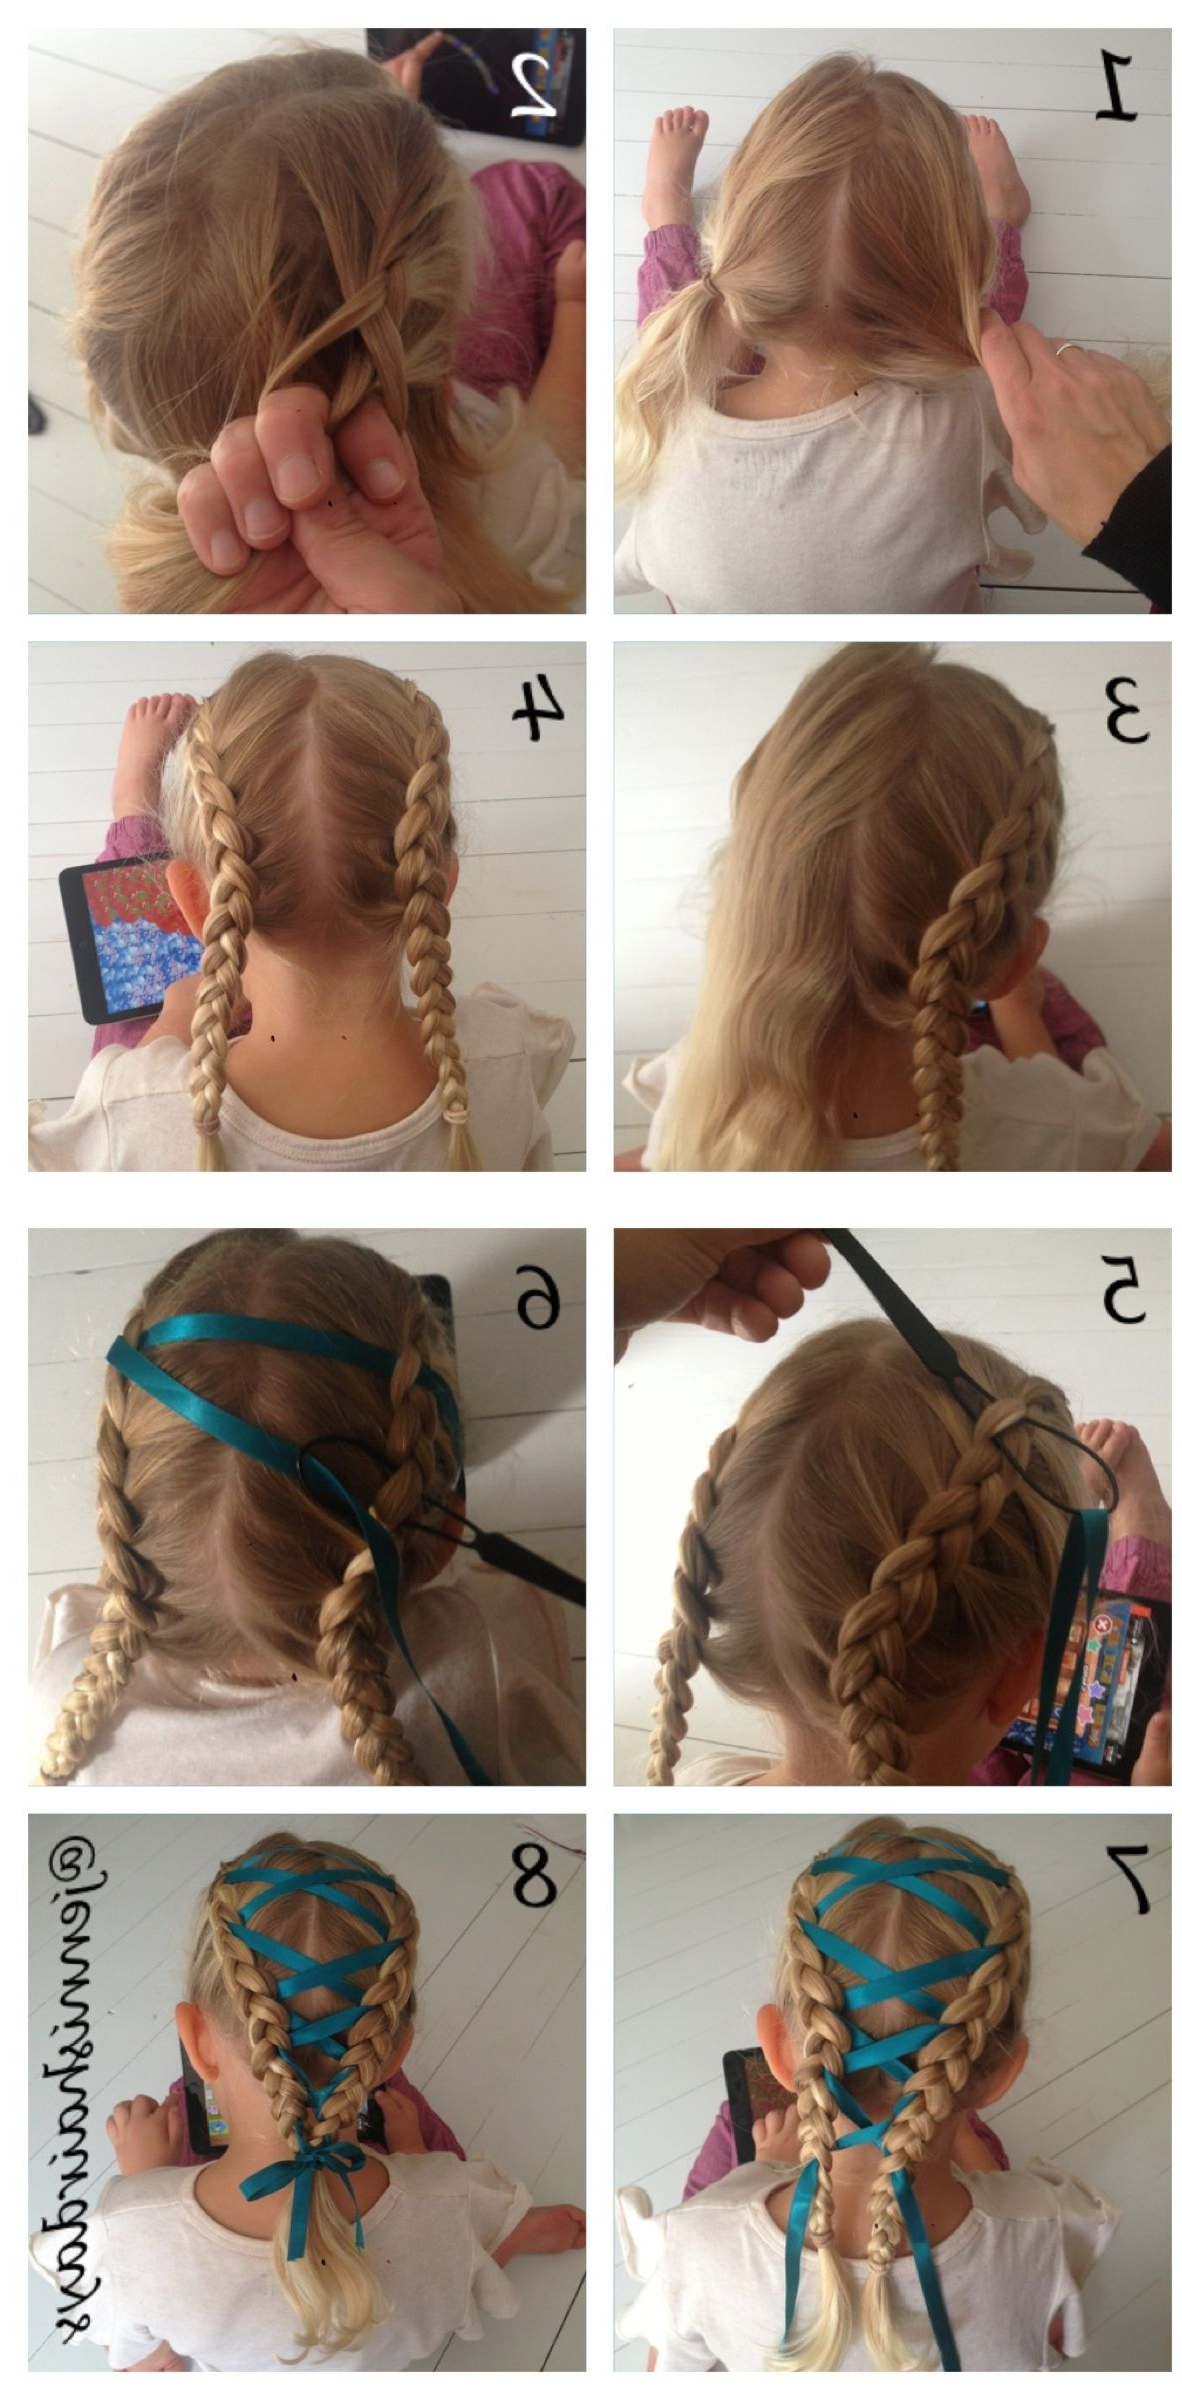 Braids, Braided Hairstyles, Hair Throughout Latest Corset Braid Hairstyles (View 4 of 20)